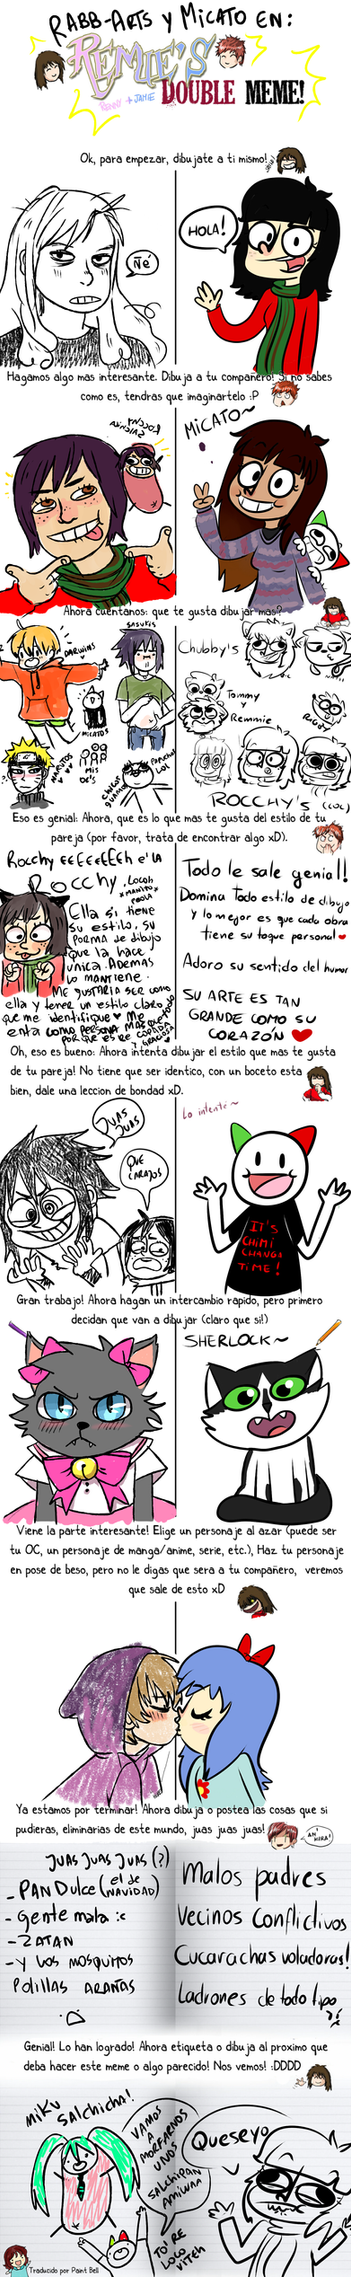 Meme de RABB ARTS y micato by Micatooo